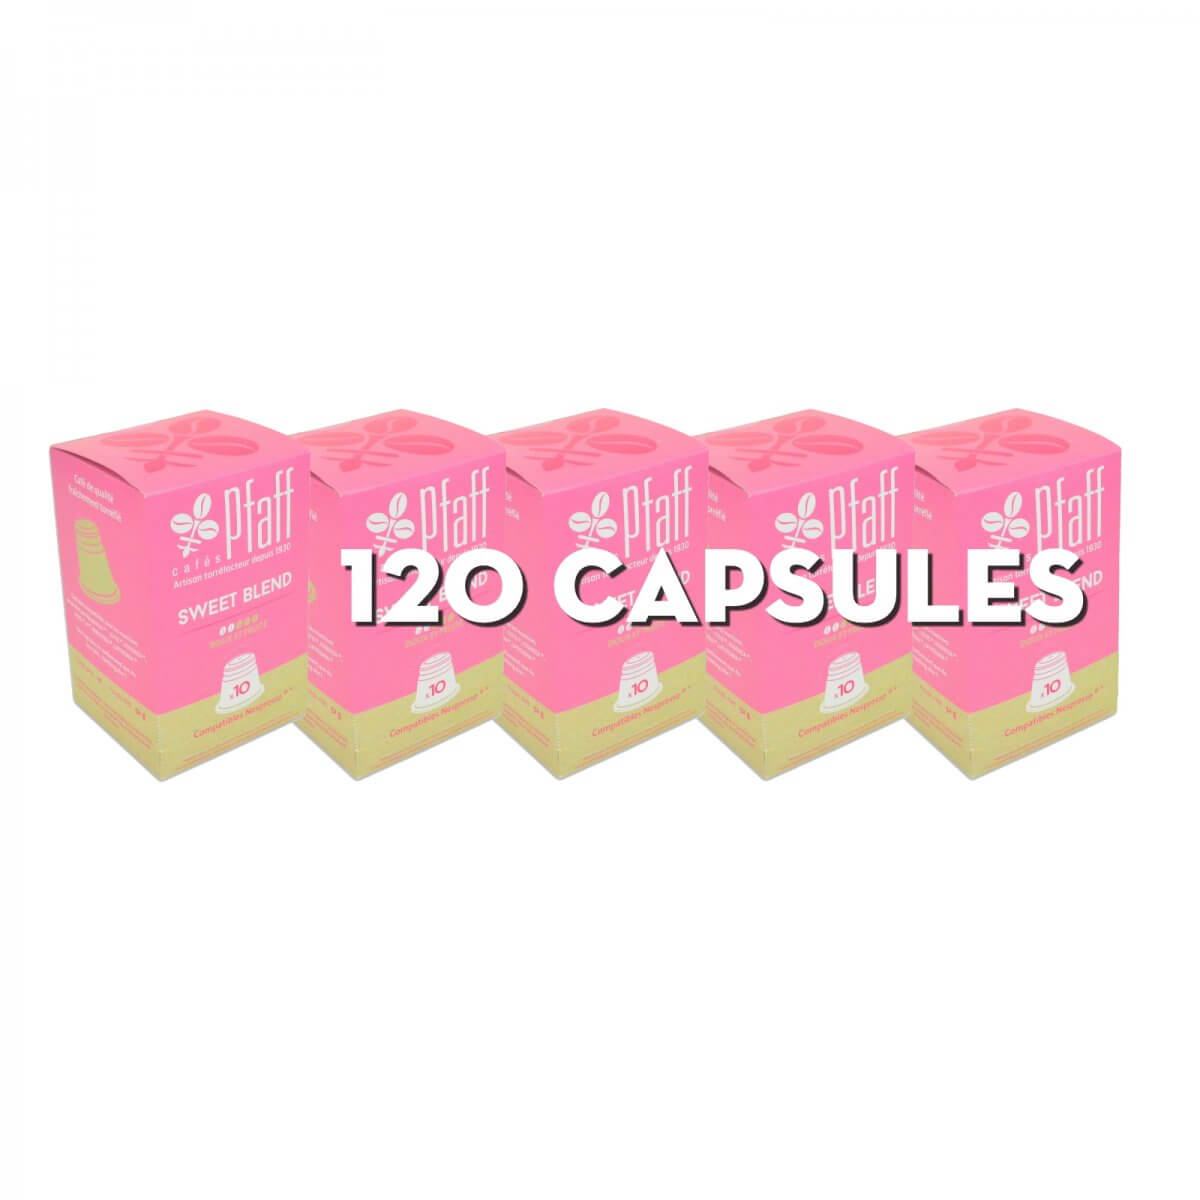 sweet blend capsules nespresso 120 cafes pfaff